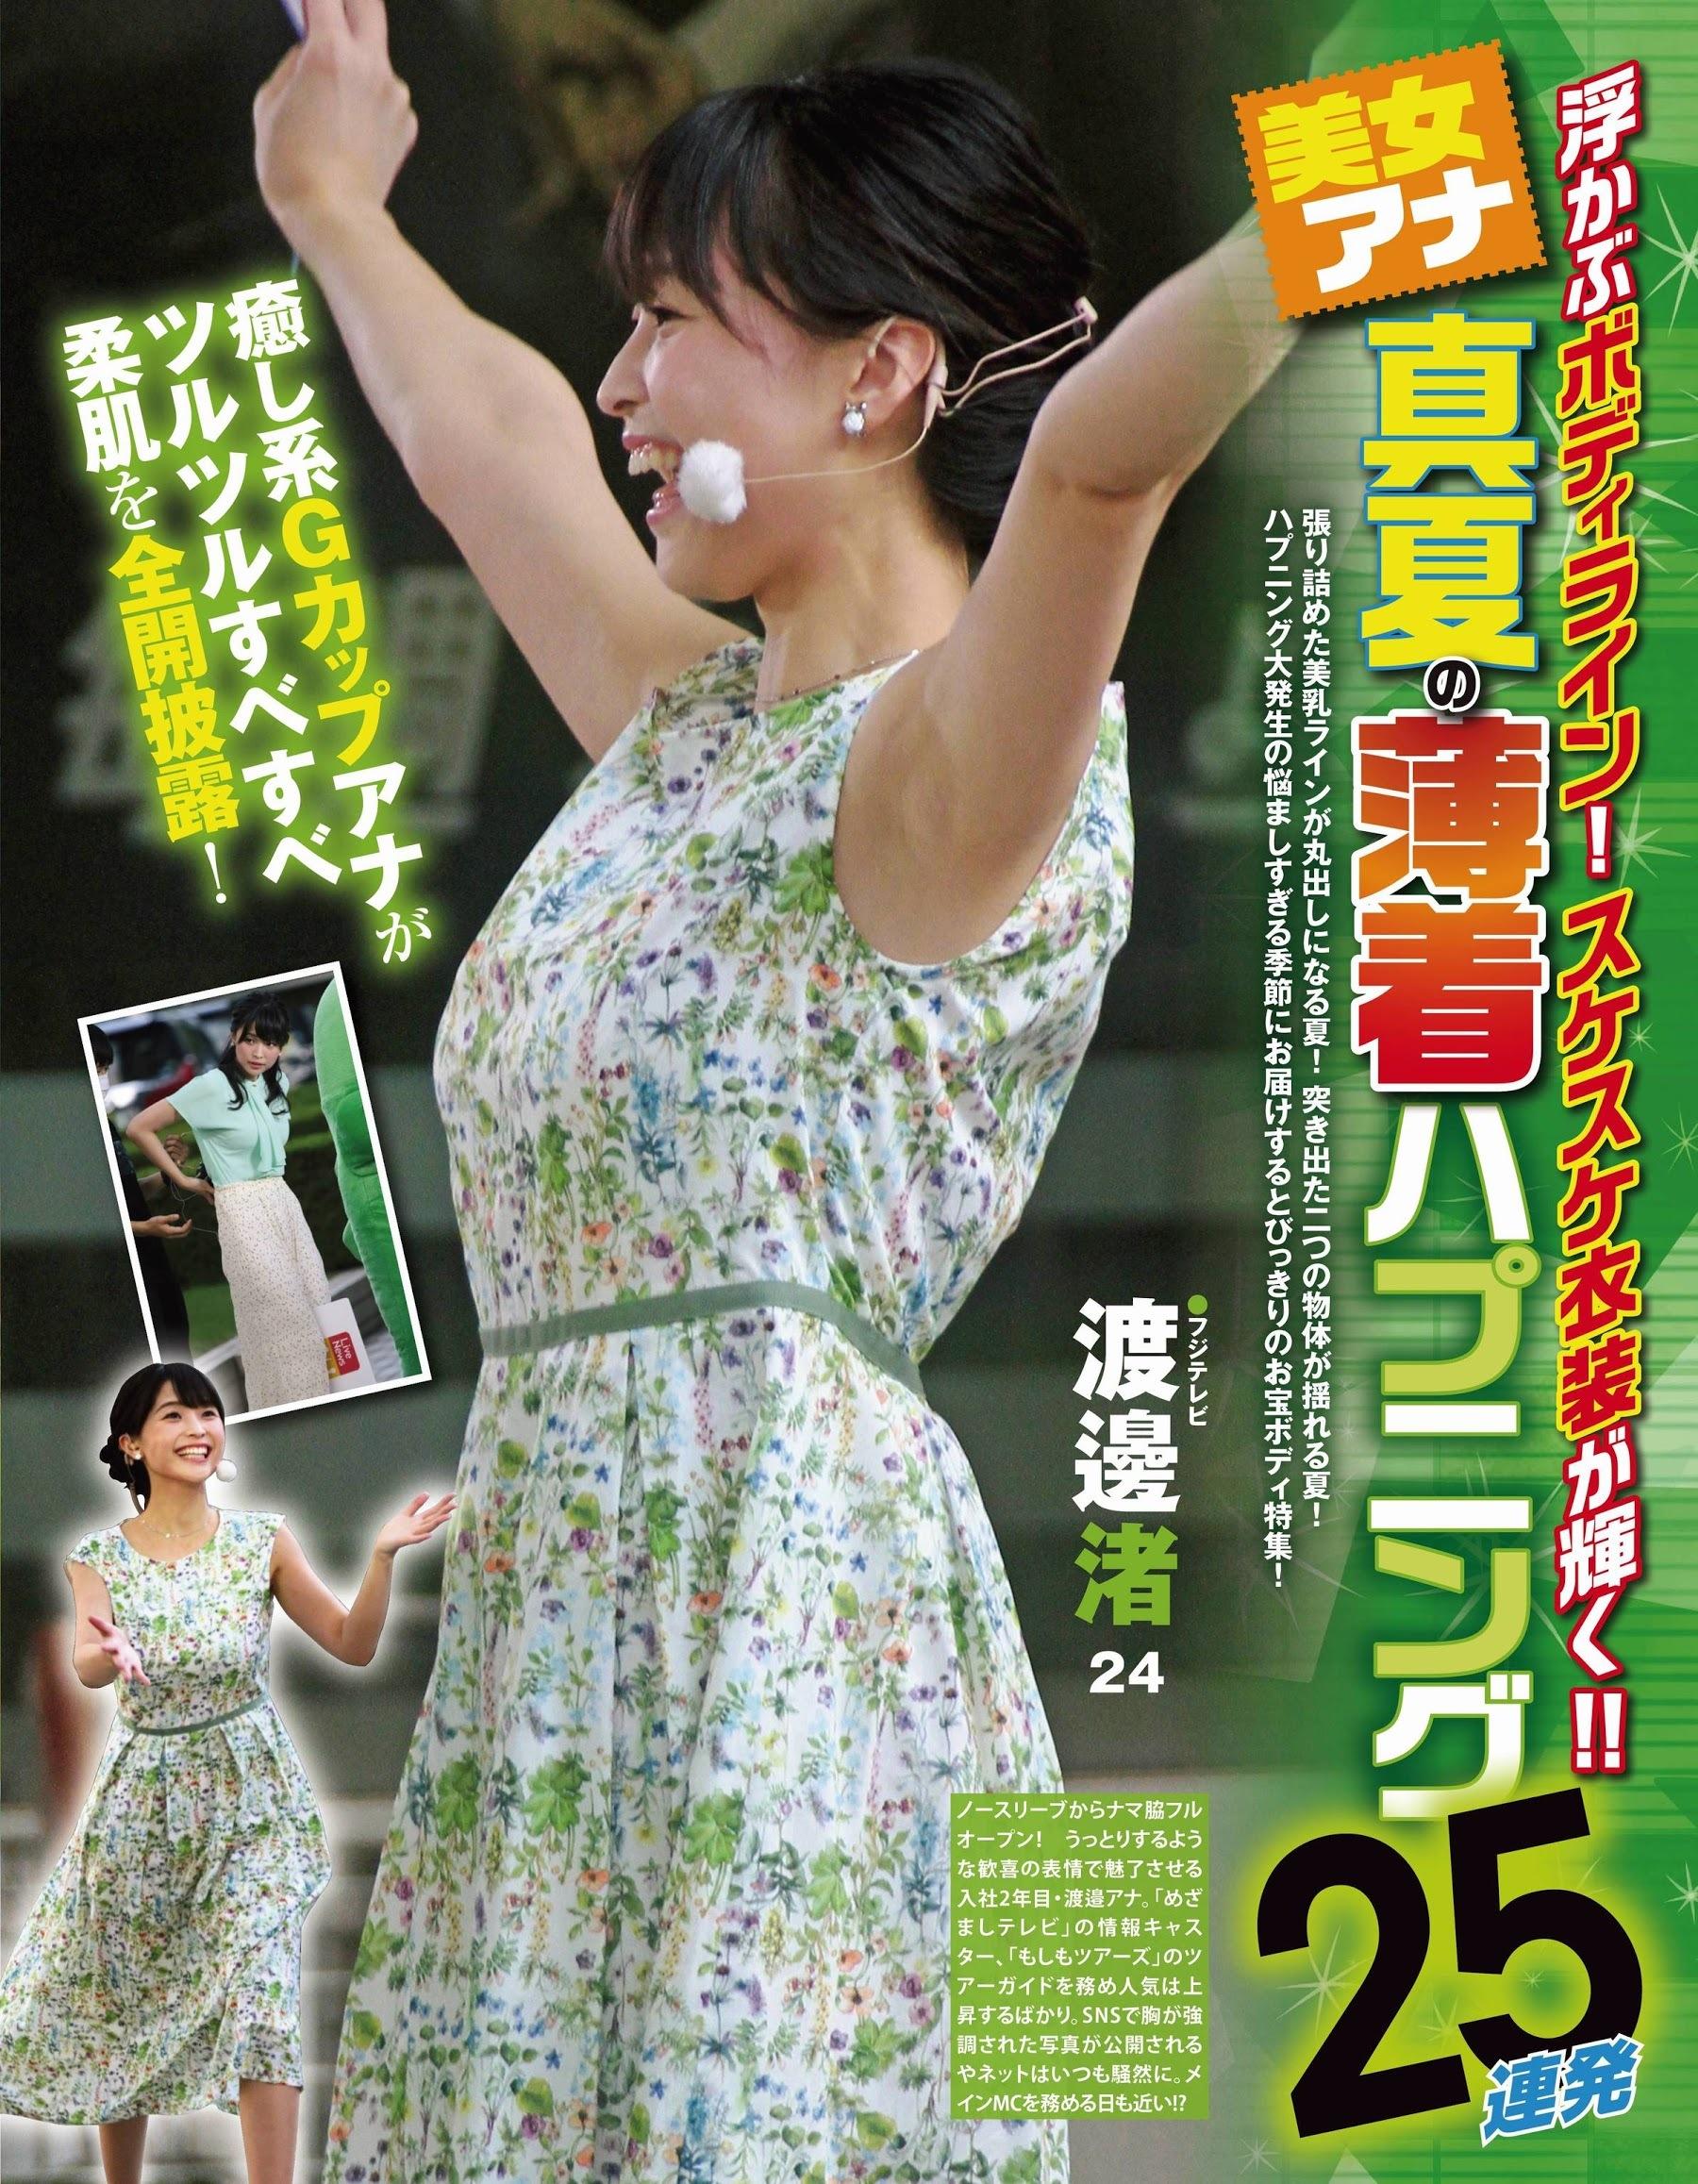 渡邊渚41